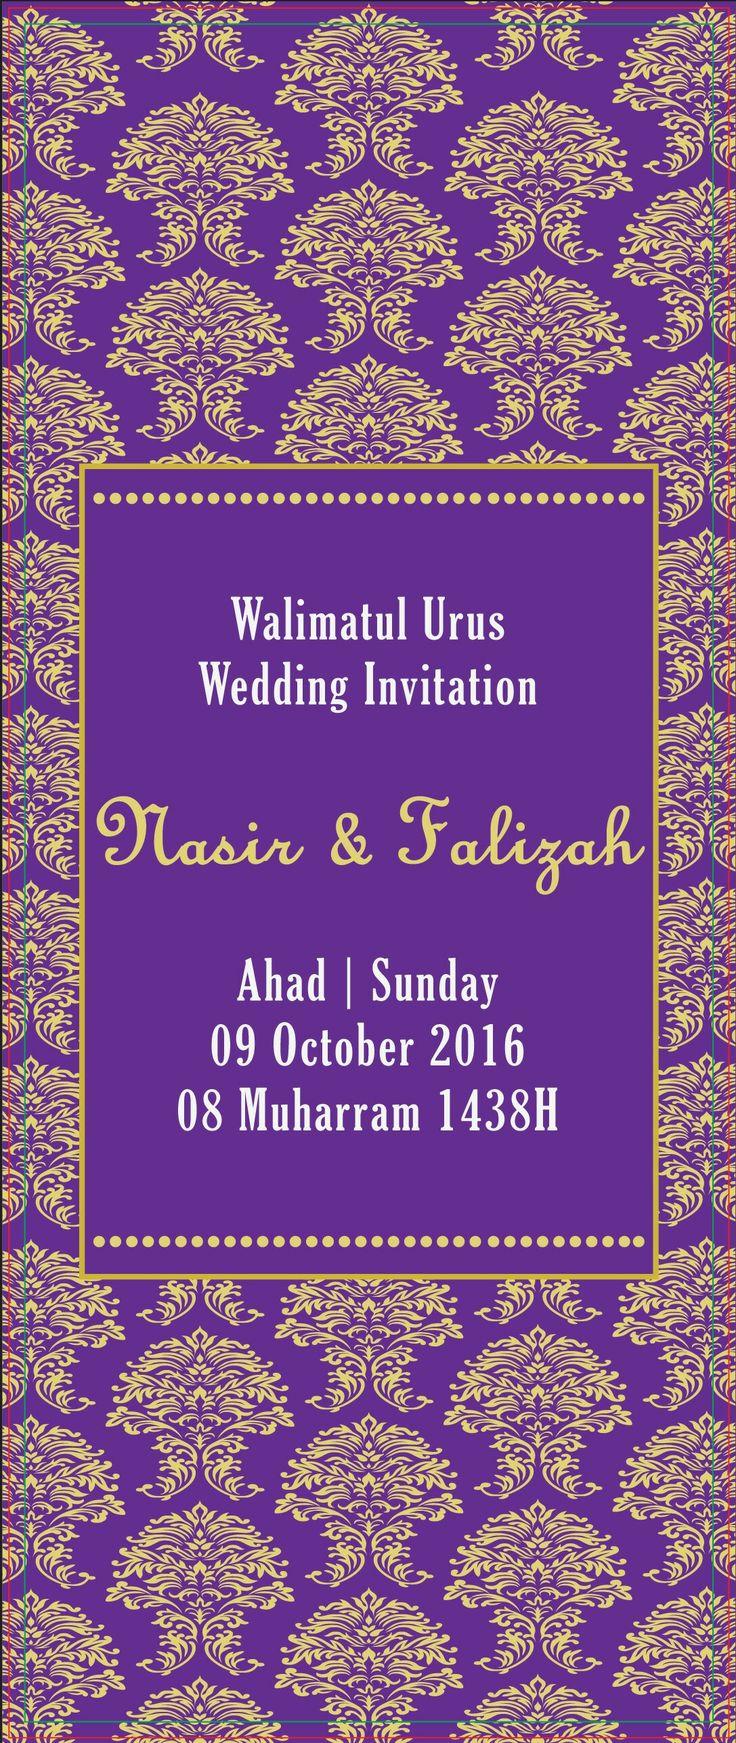 my wedding invitation by forever printz (fb) gold + purple theme